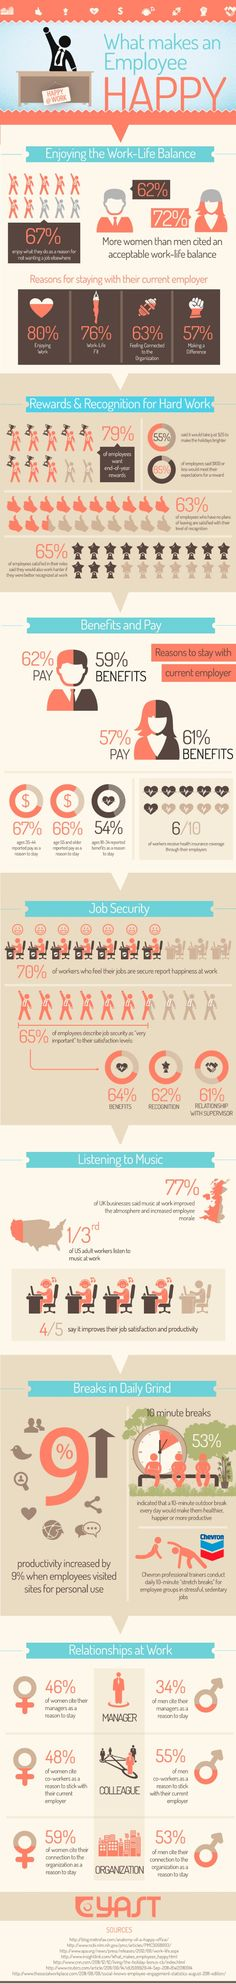 Infographic: Happy Employees by Brian Junyor via slideshare